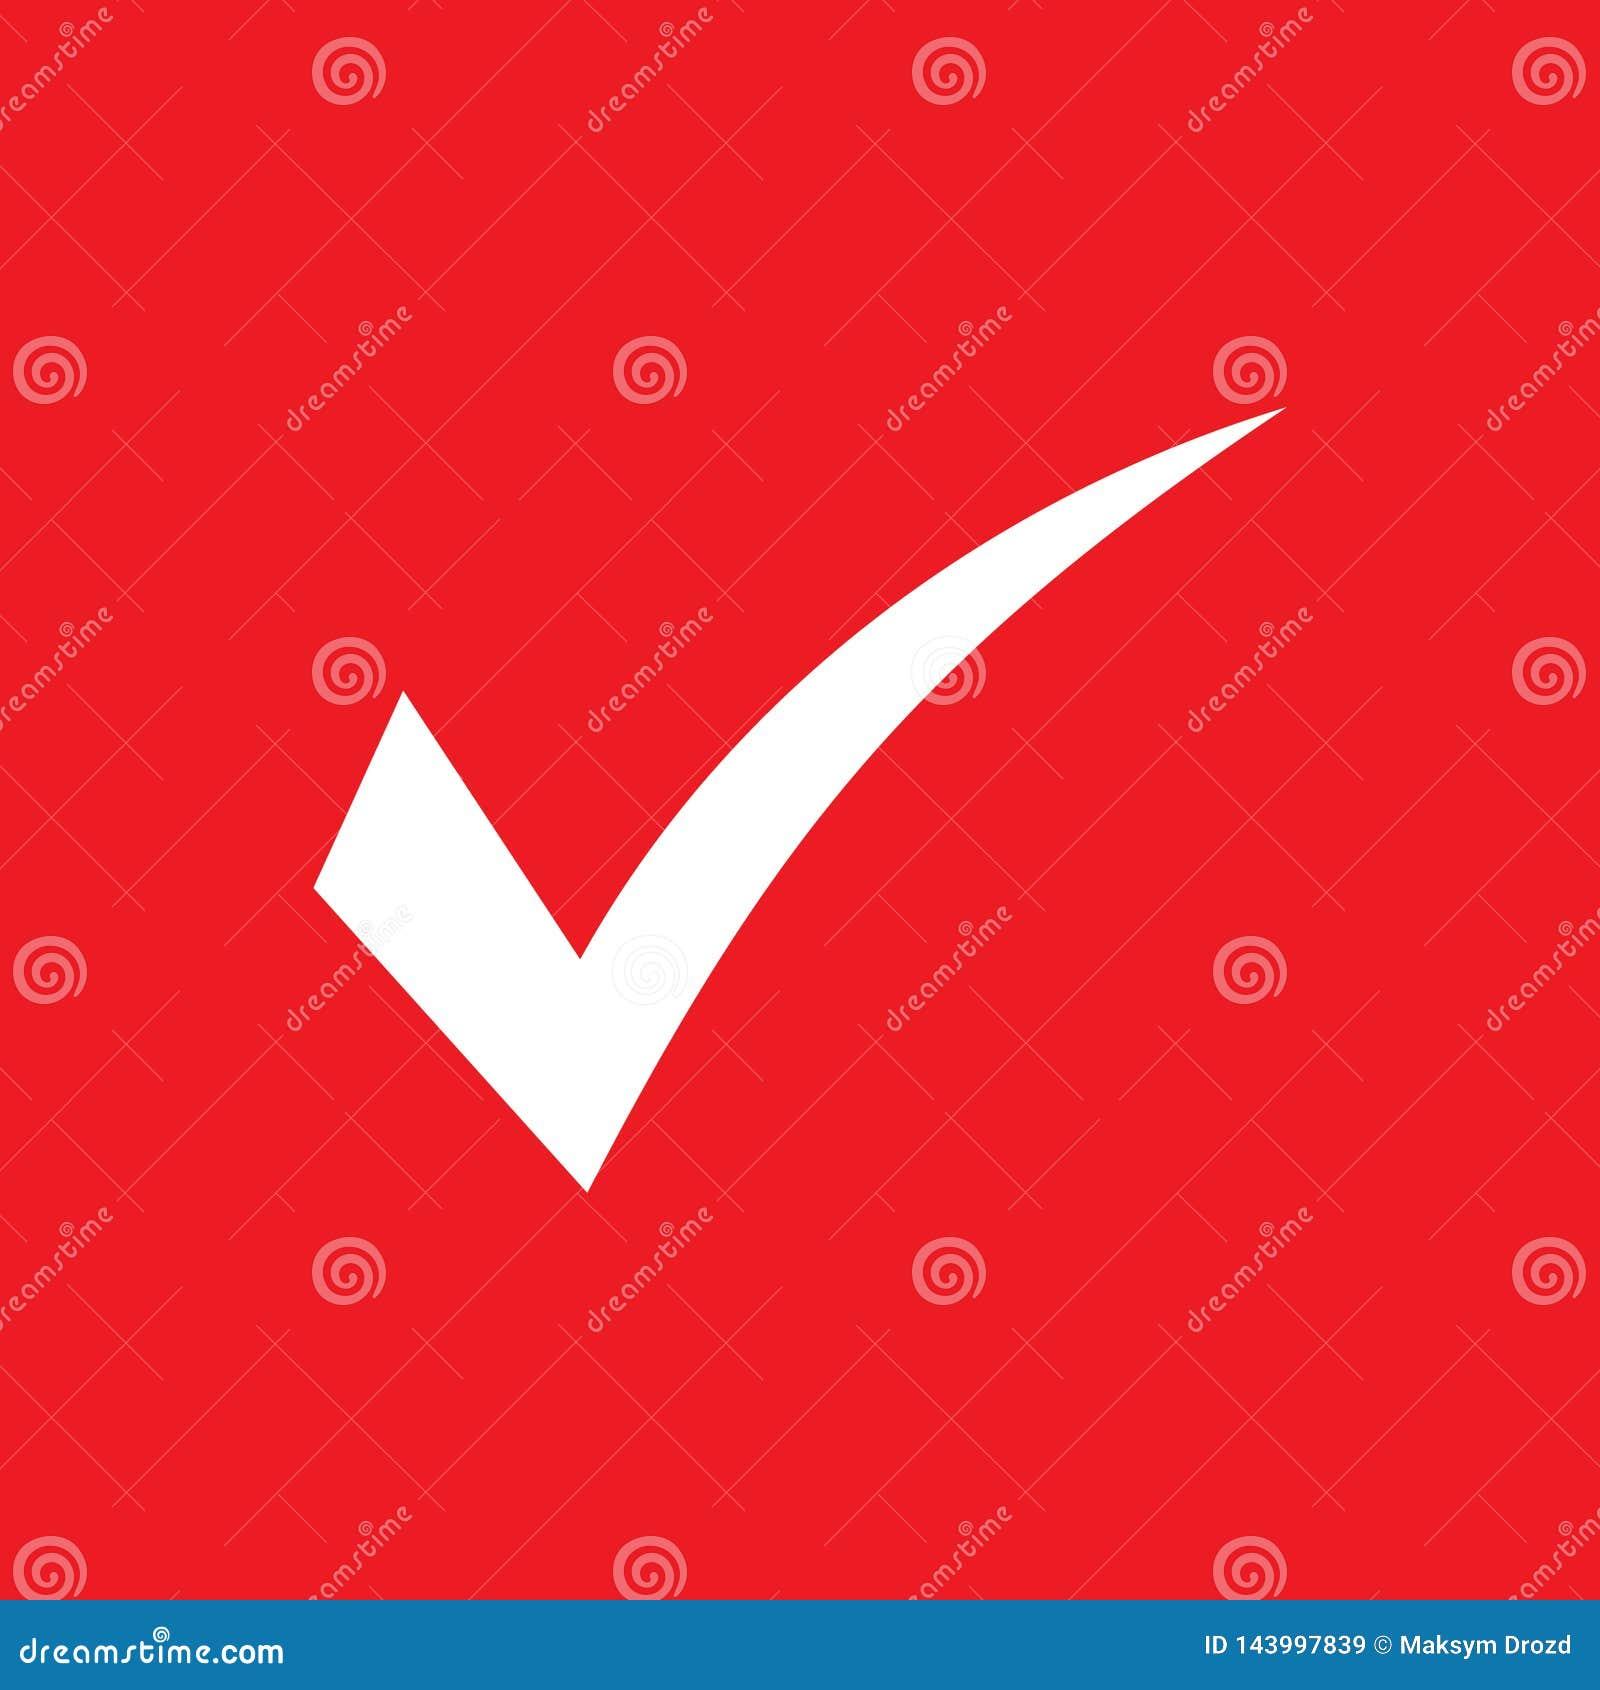 White Check Mark Icon On Red Background  Tick Symbol, Tick